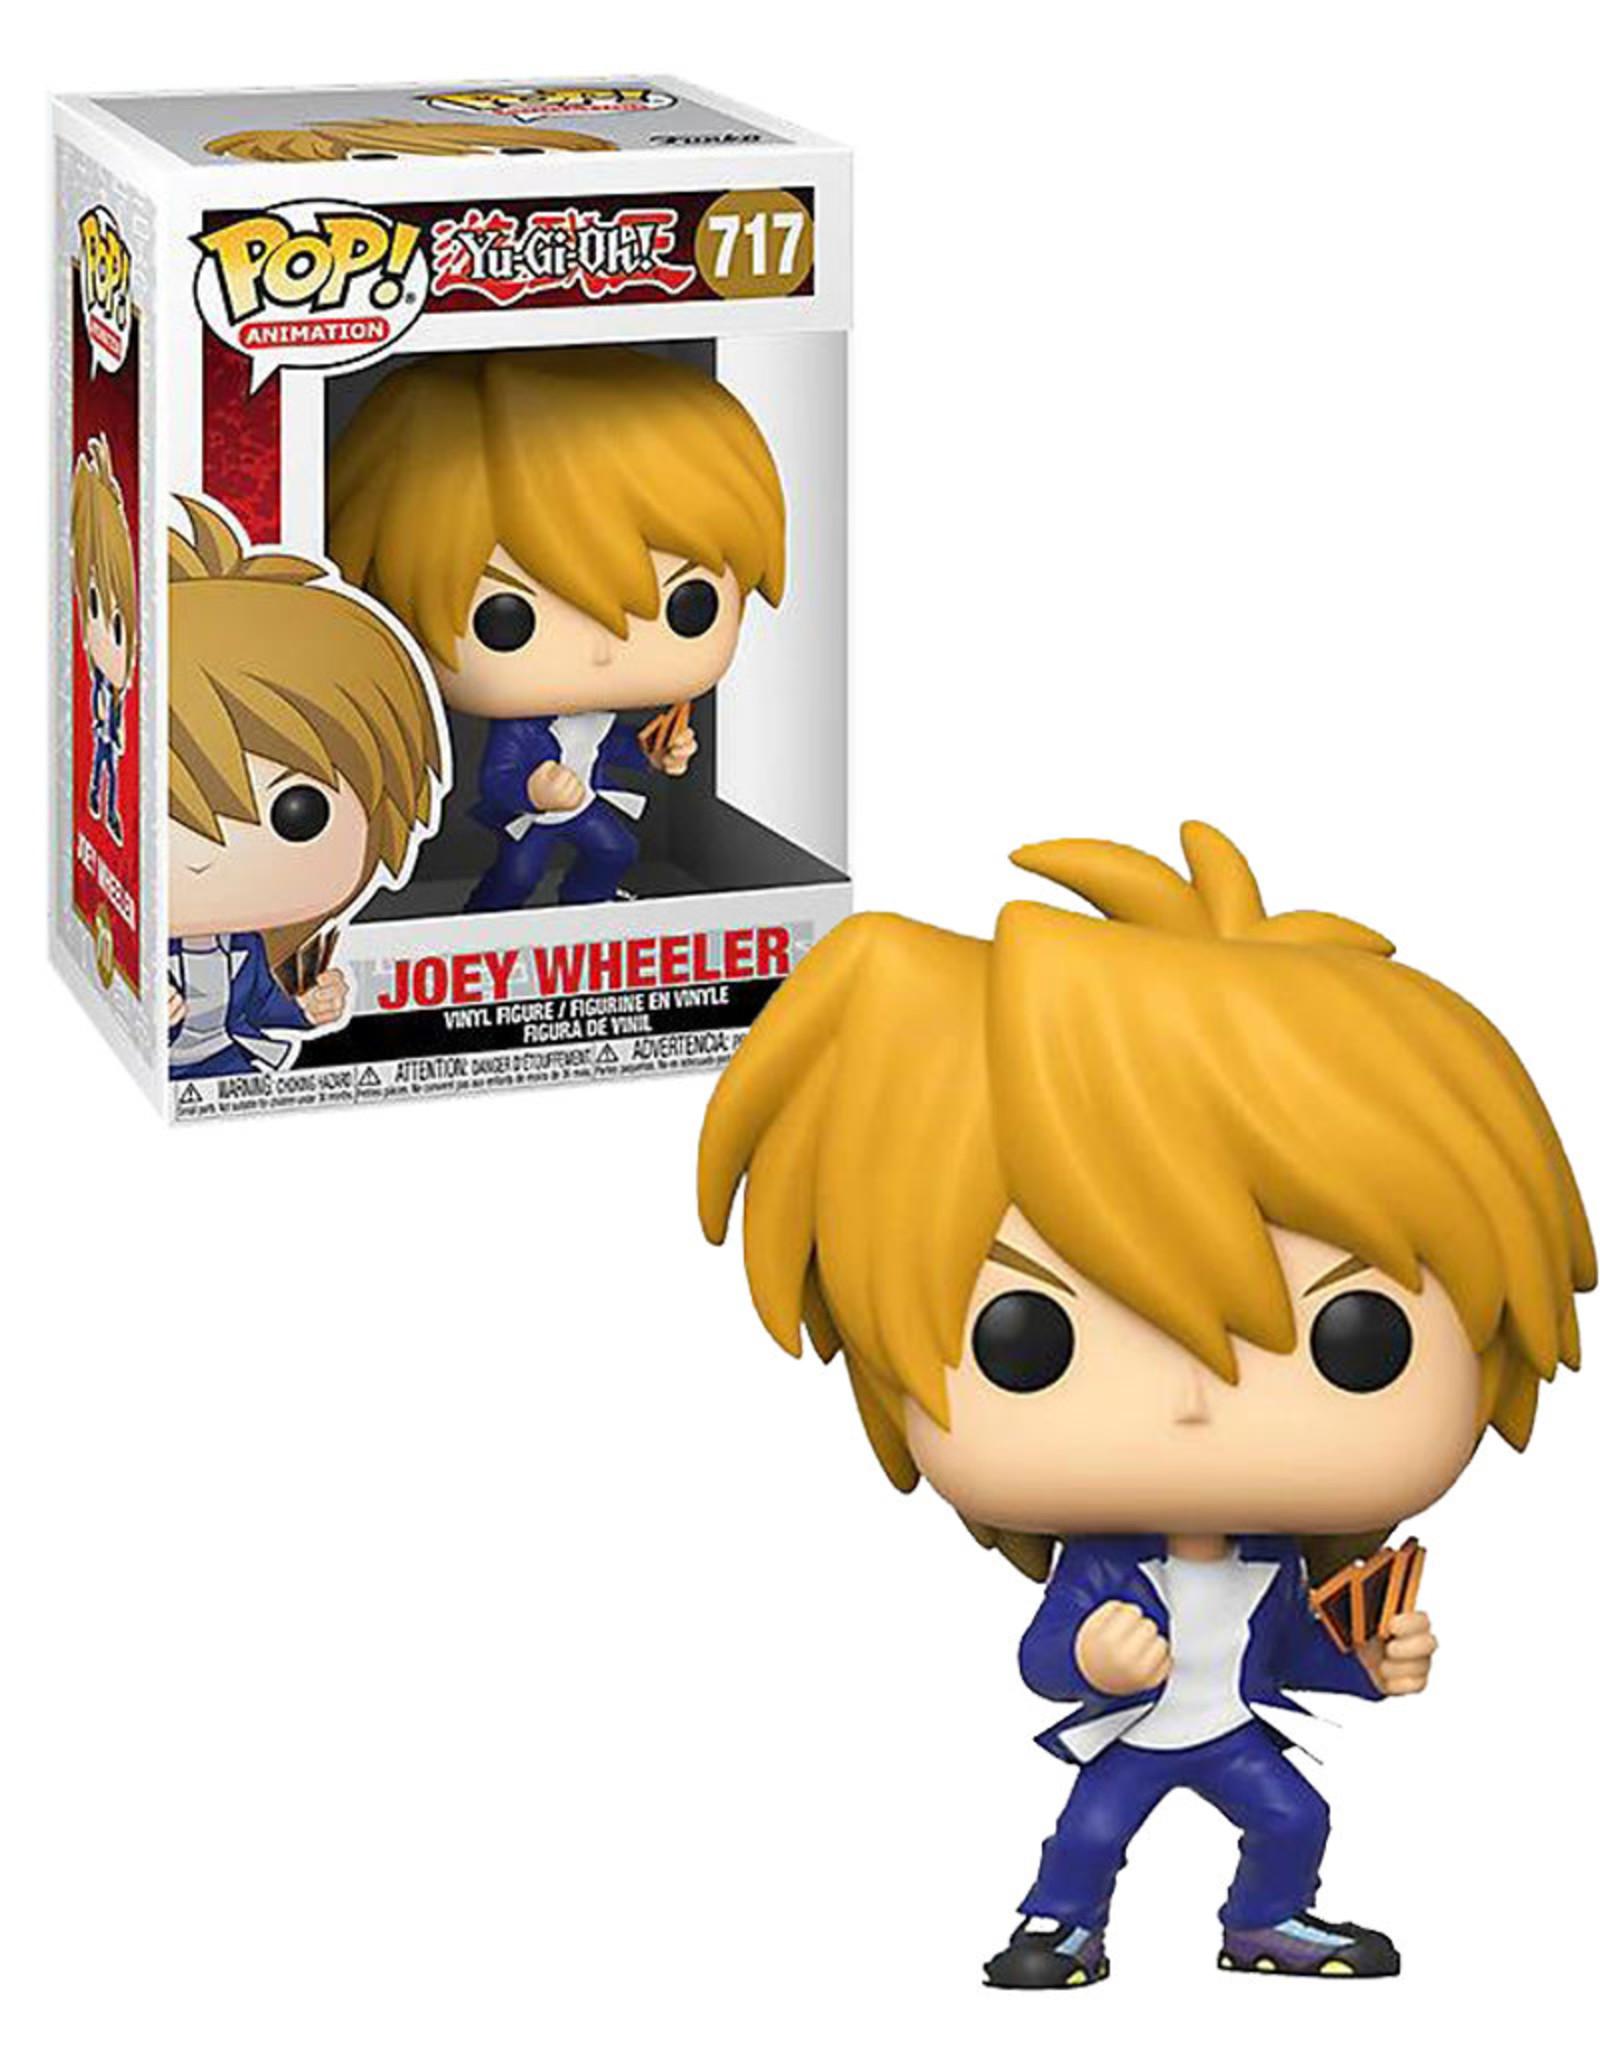 Yu-Gi-Oh! 717 ( Funko Pop ) Joey Wheeler